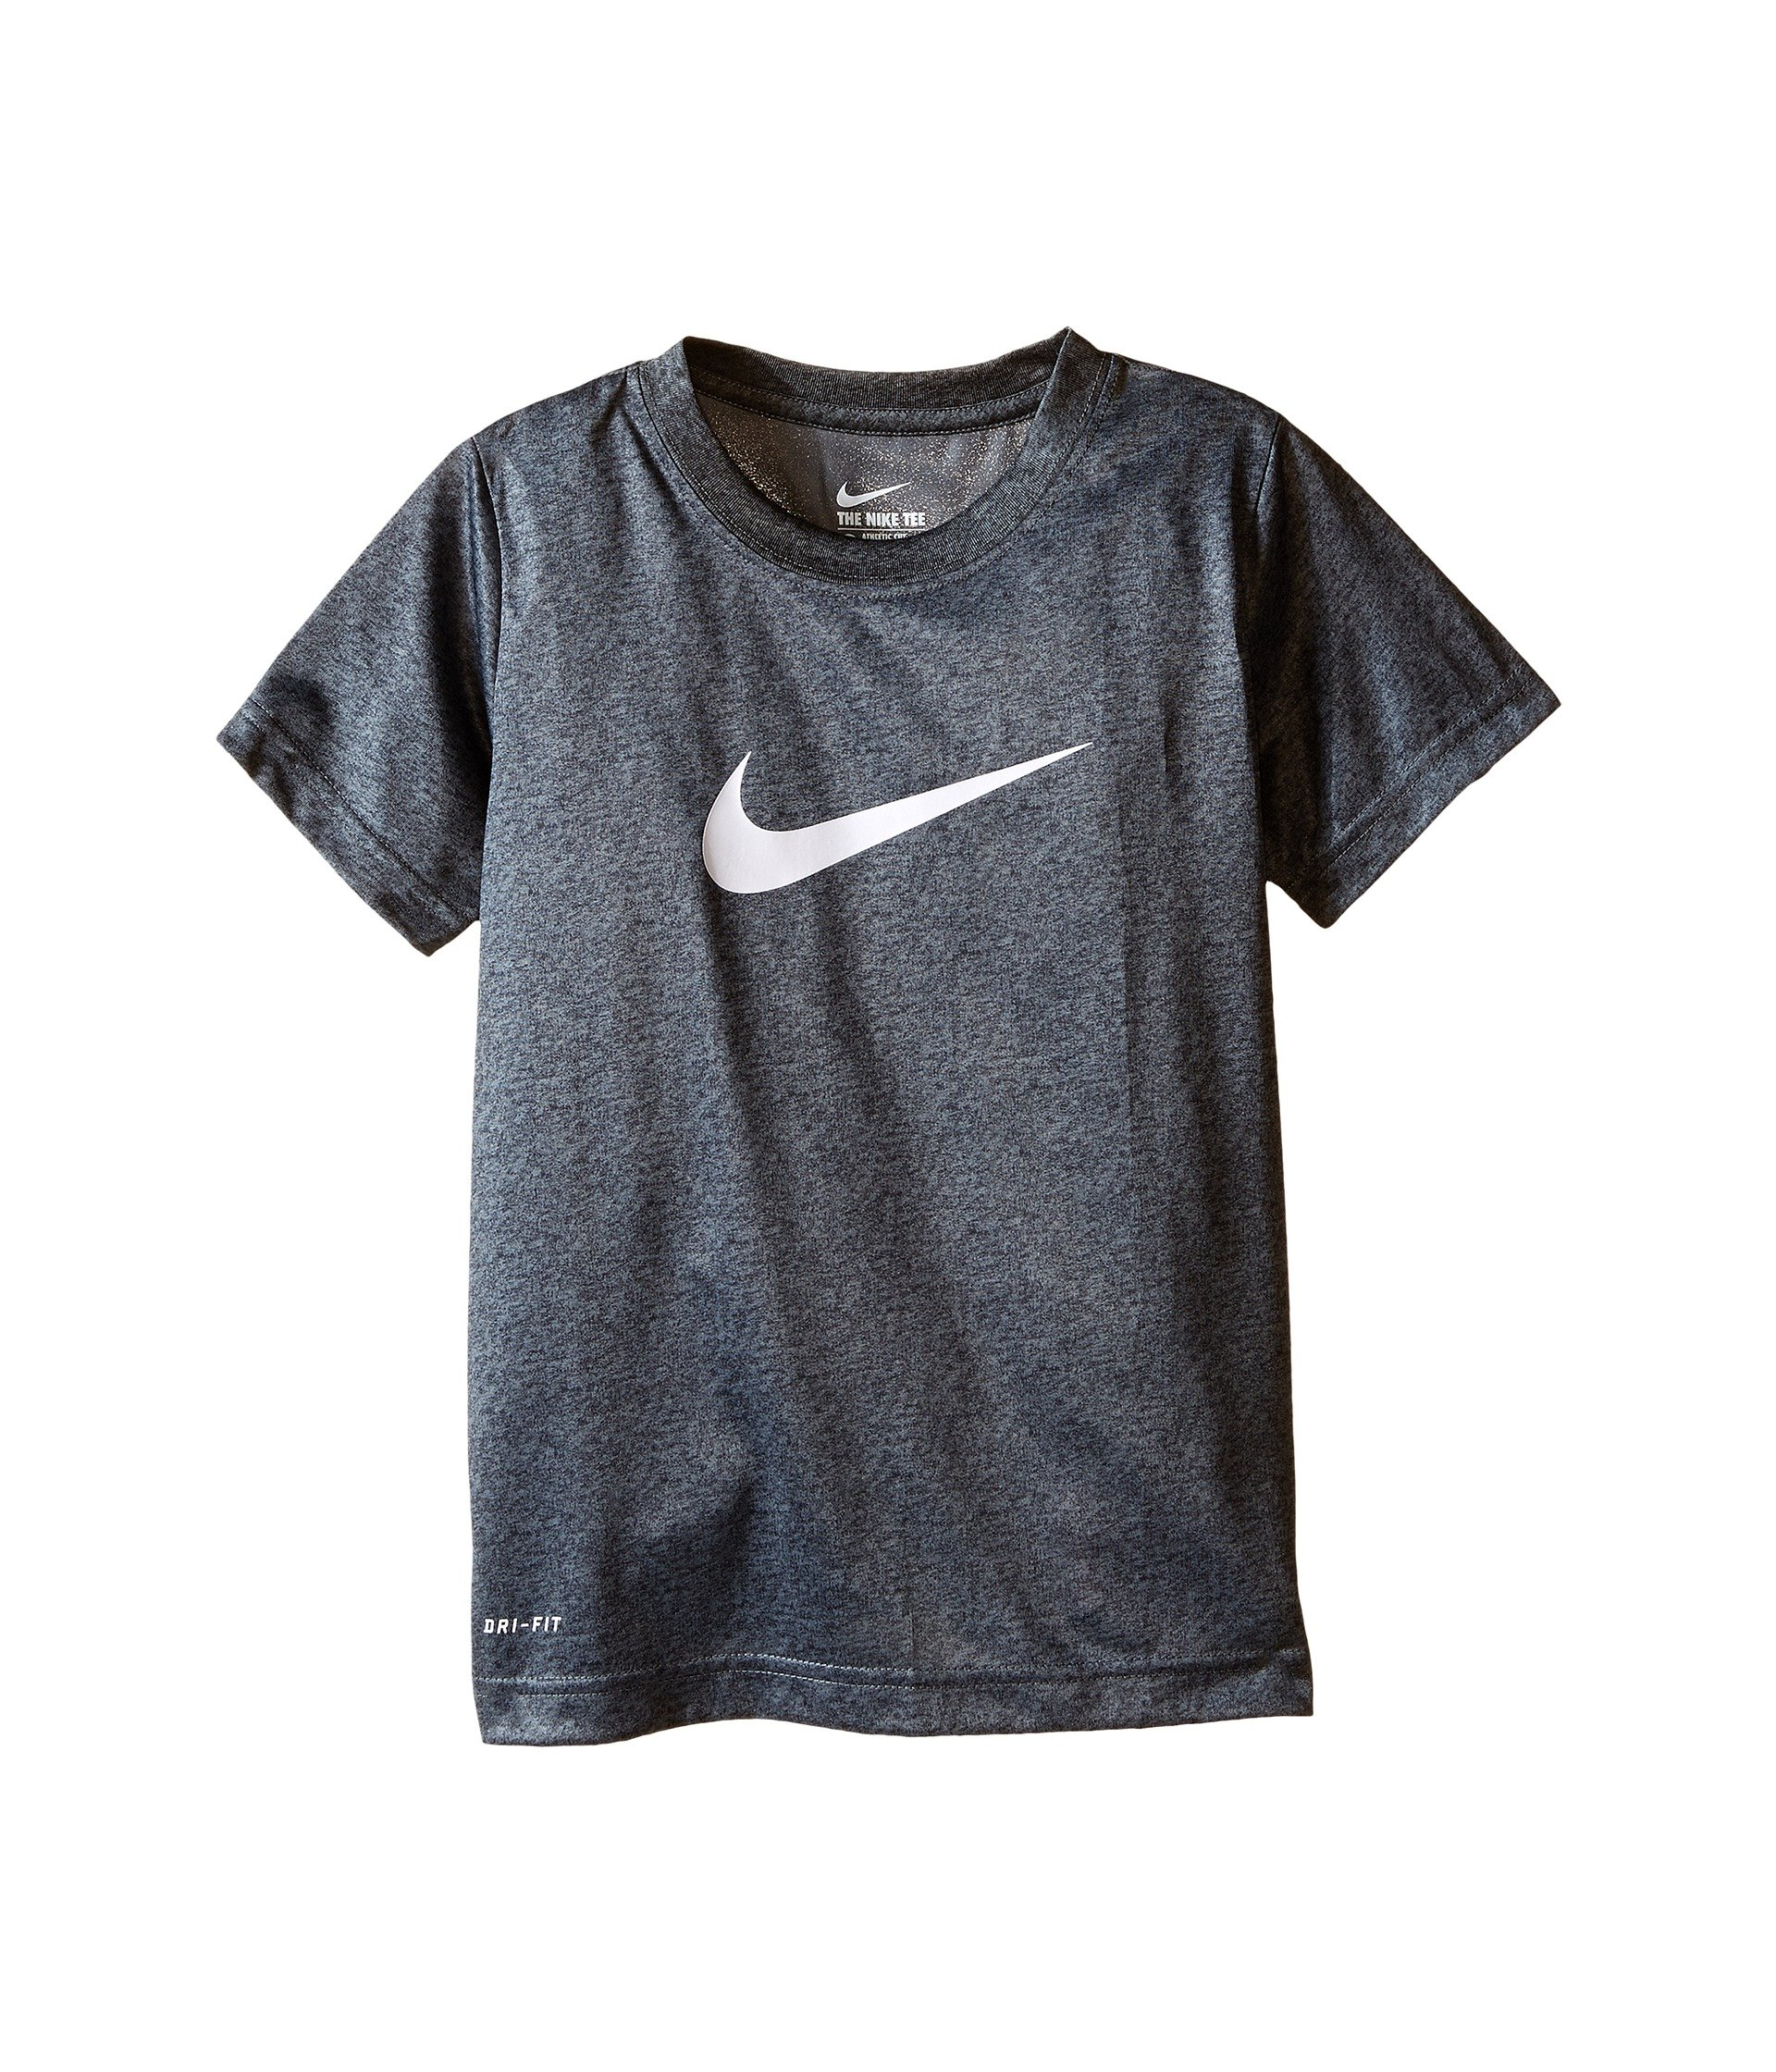 Nike Boys Dri-FIT Performance Jersey Tee Size:7 (Small)